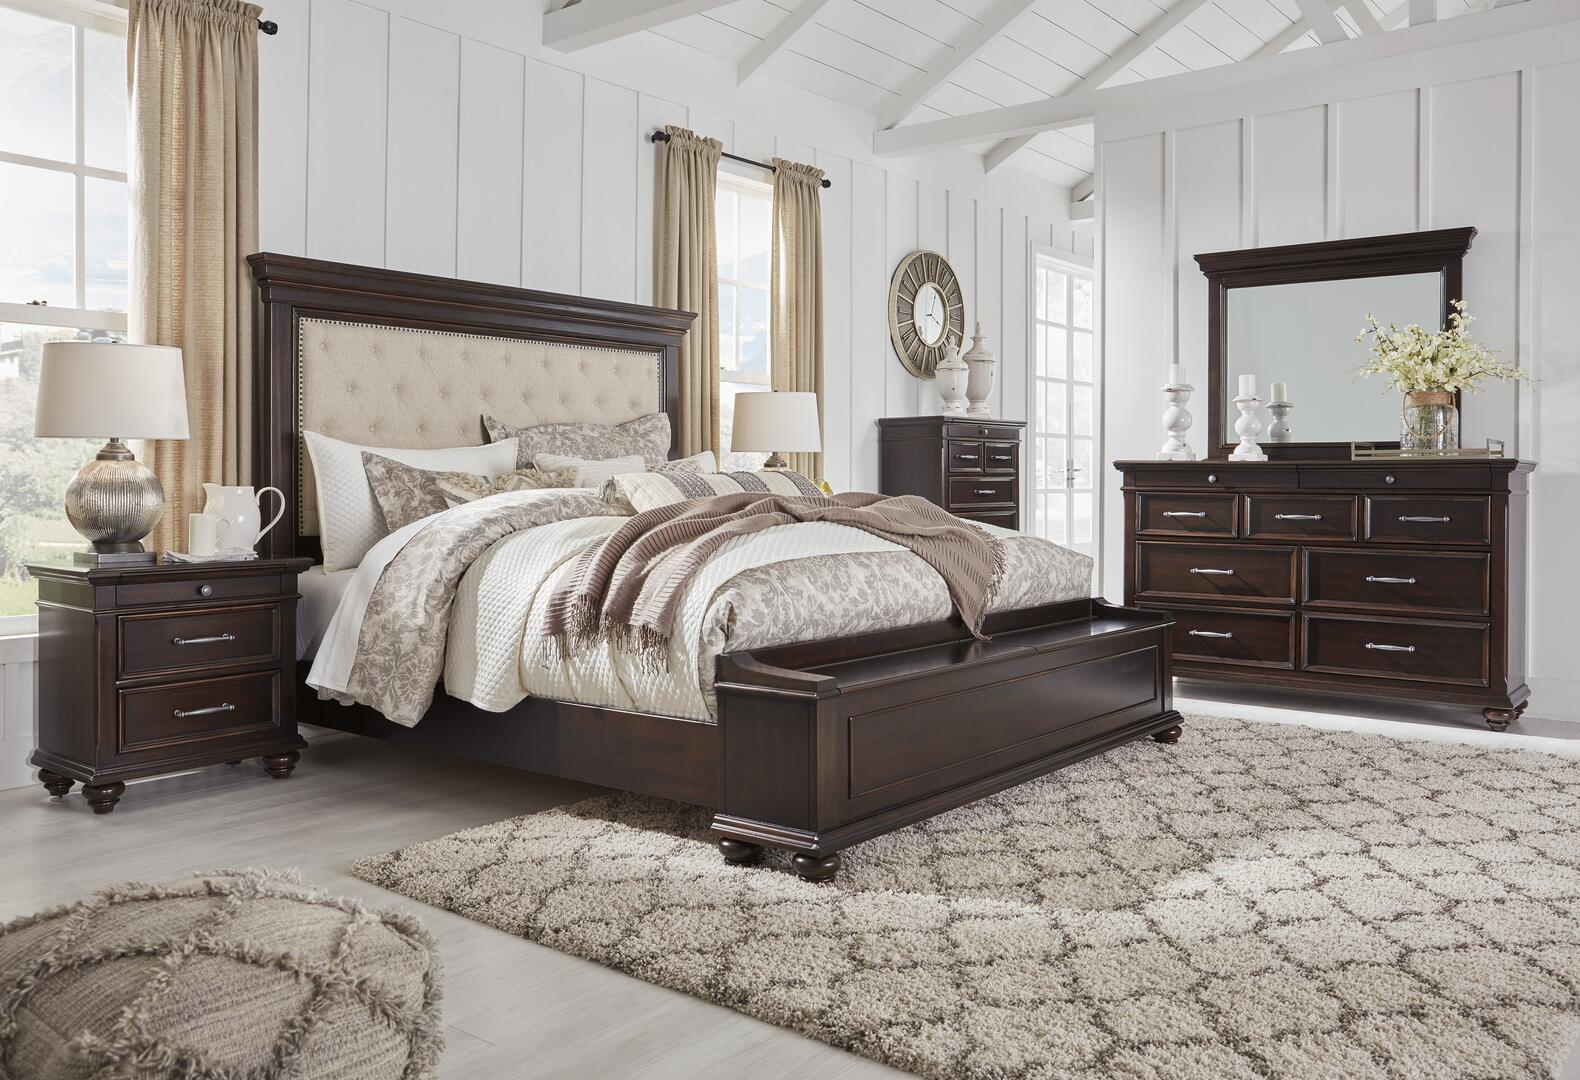 Signature Design by Ashley Brynhurst 5 Piece Queen Size Bedroom Set